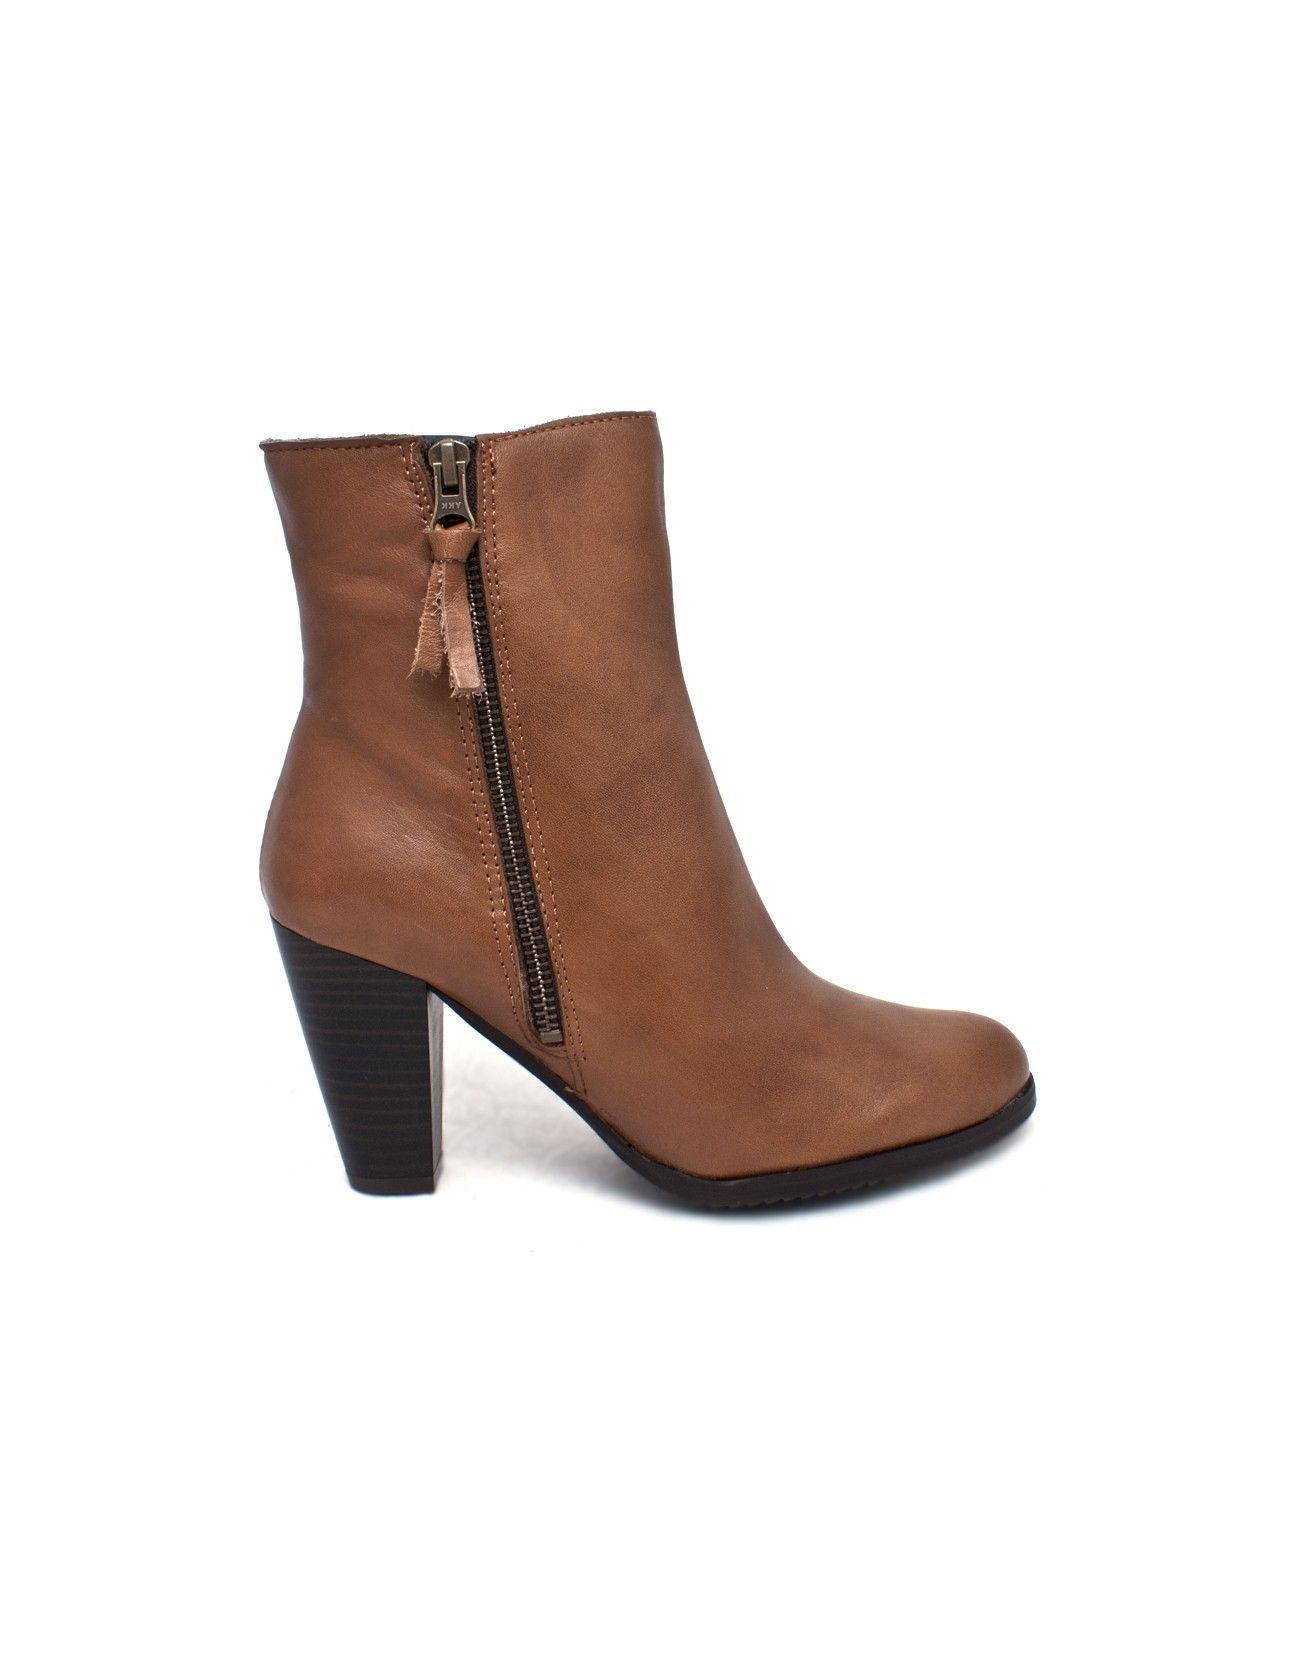 2fe103c85b6 Botín LV Calzado Mujer